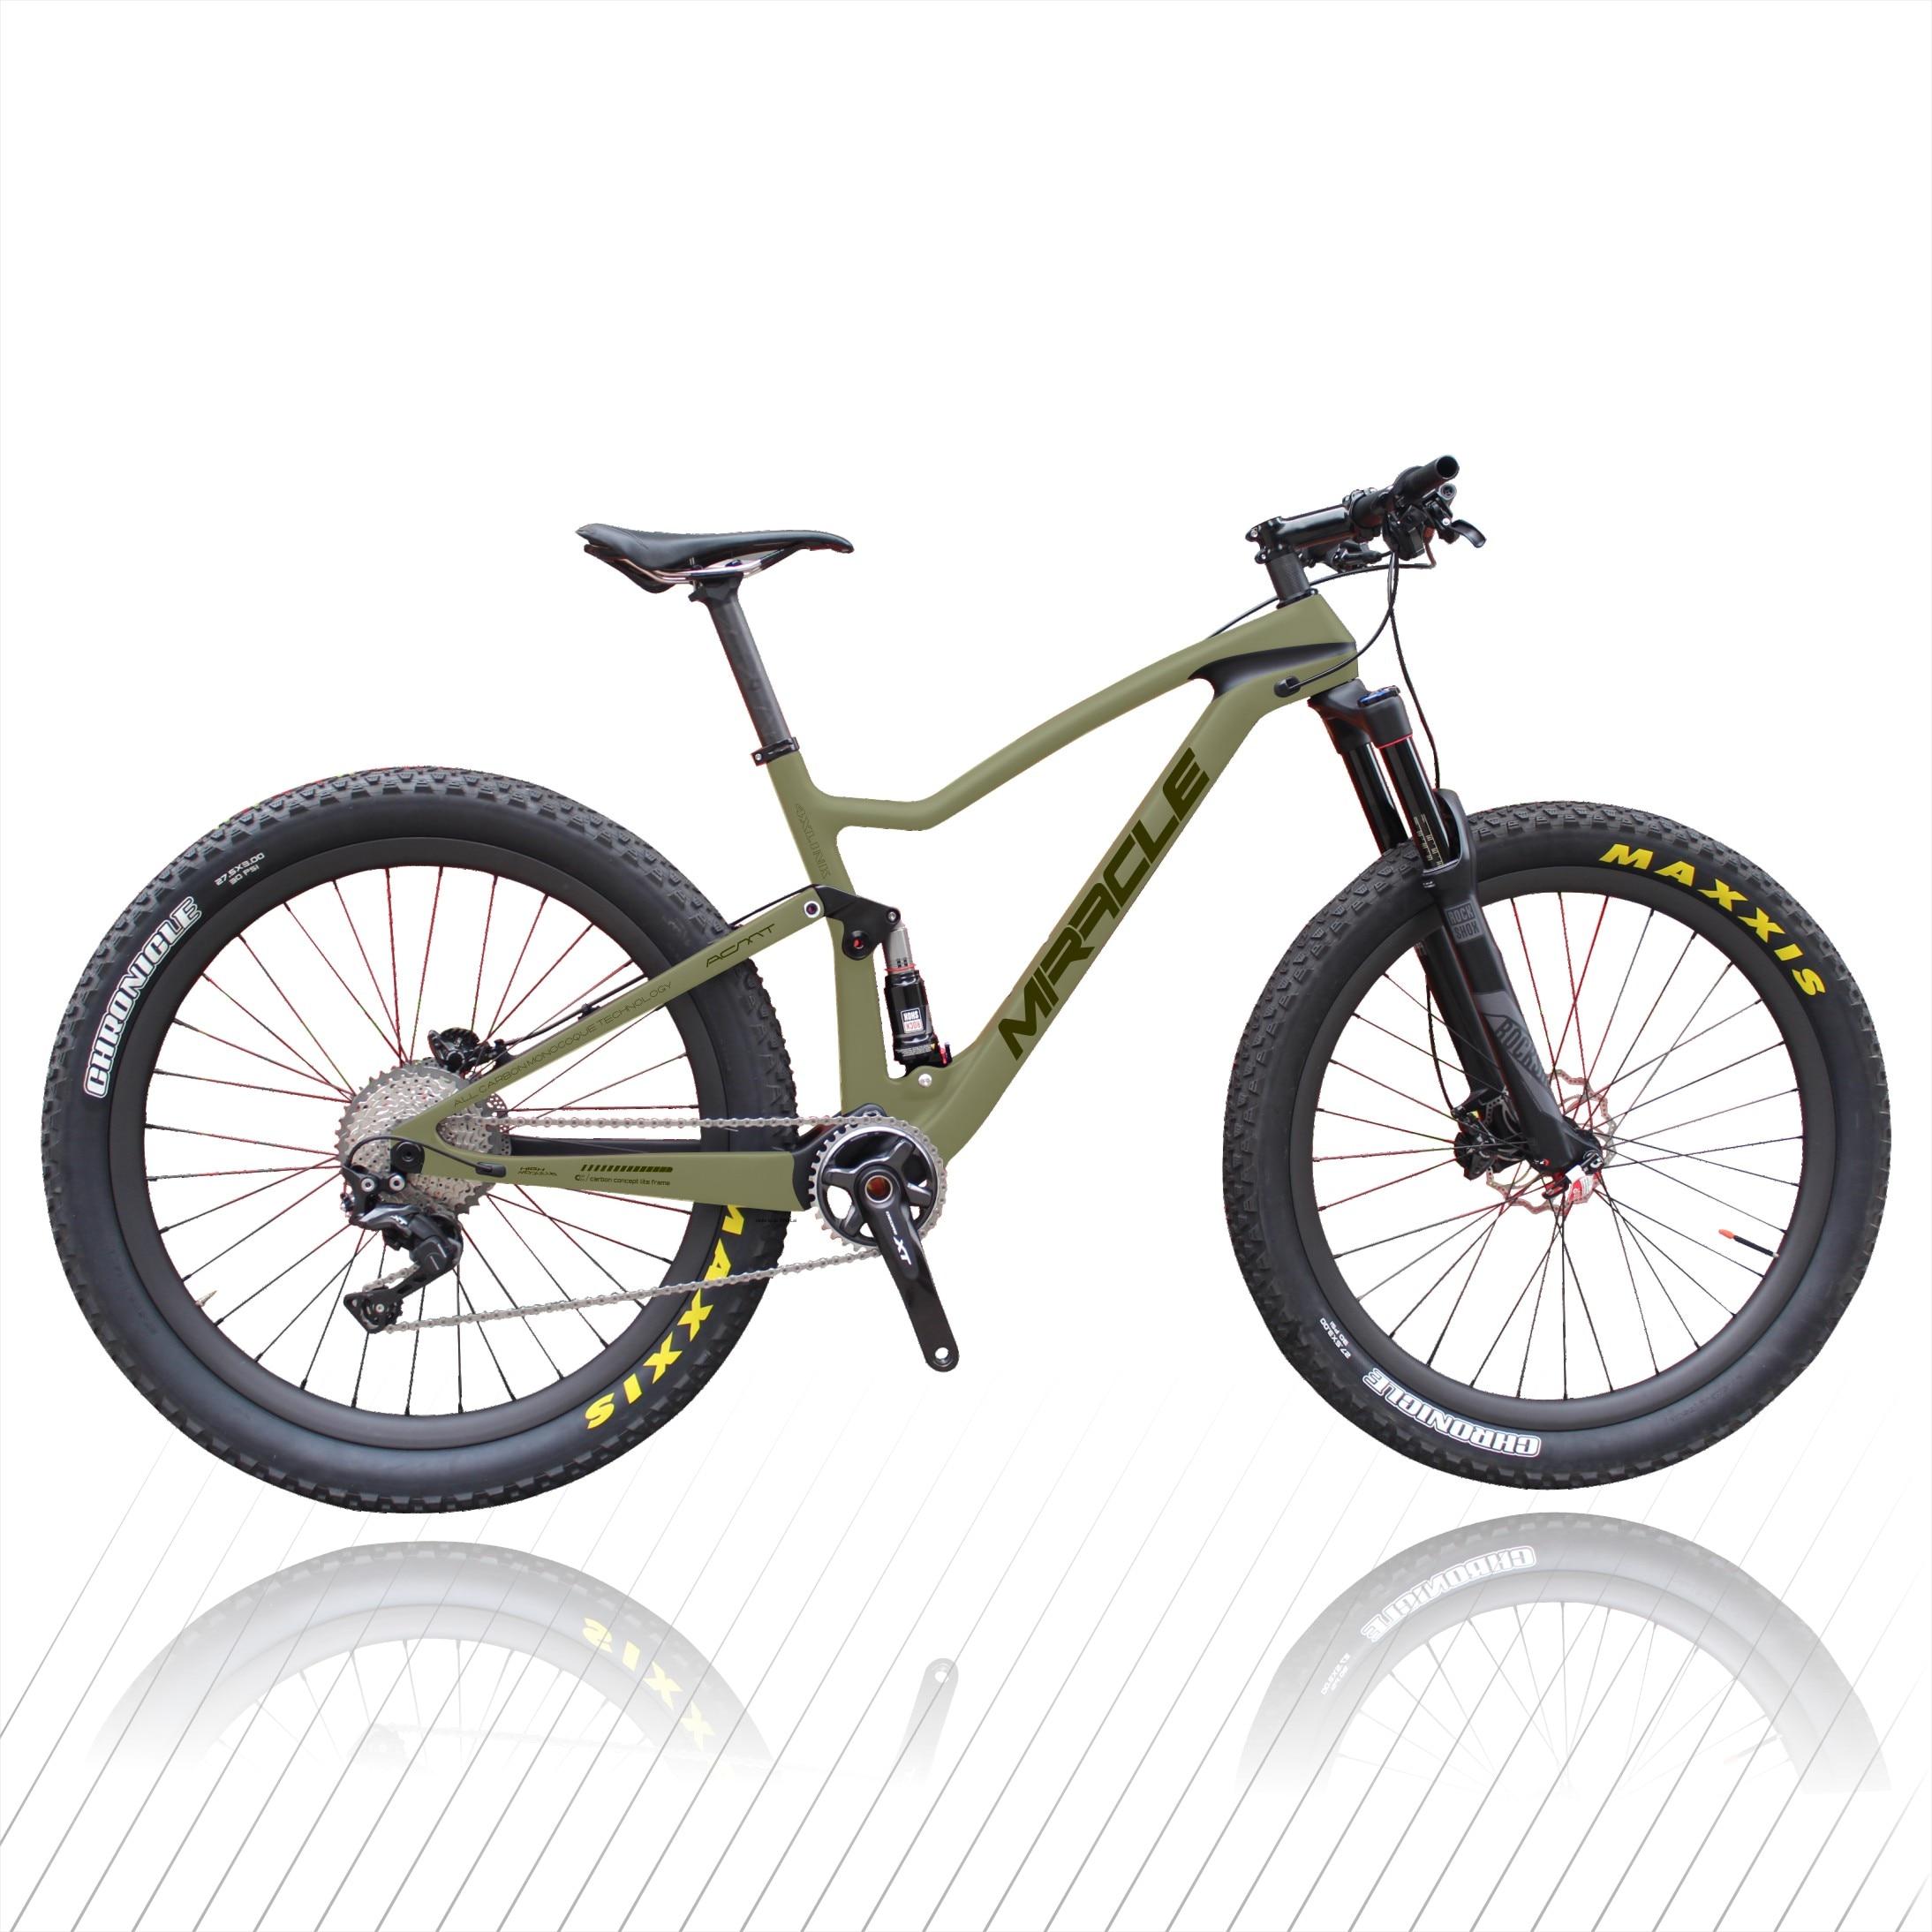 2020 Super light 29er Boosts Carbon Mtb full Bicycle Mountain font b bike b font Carbon